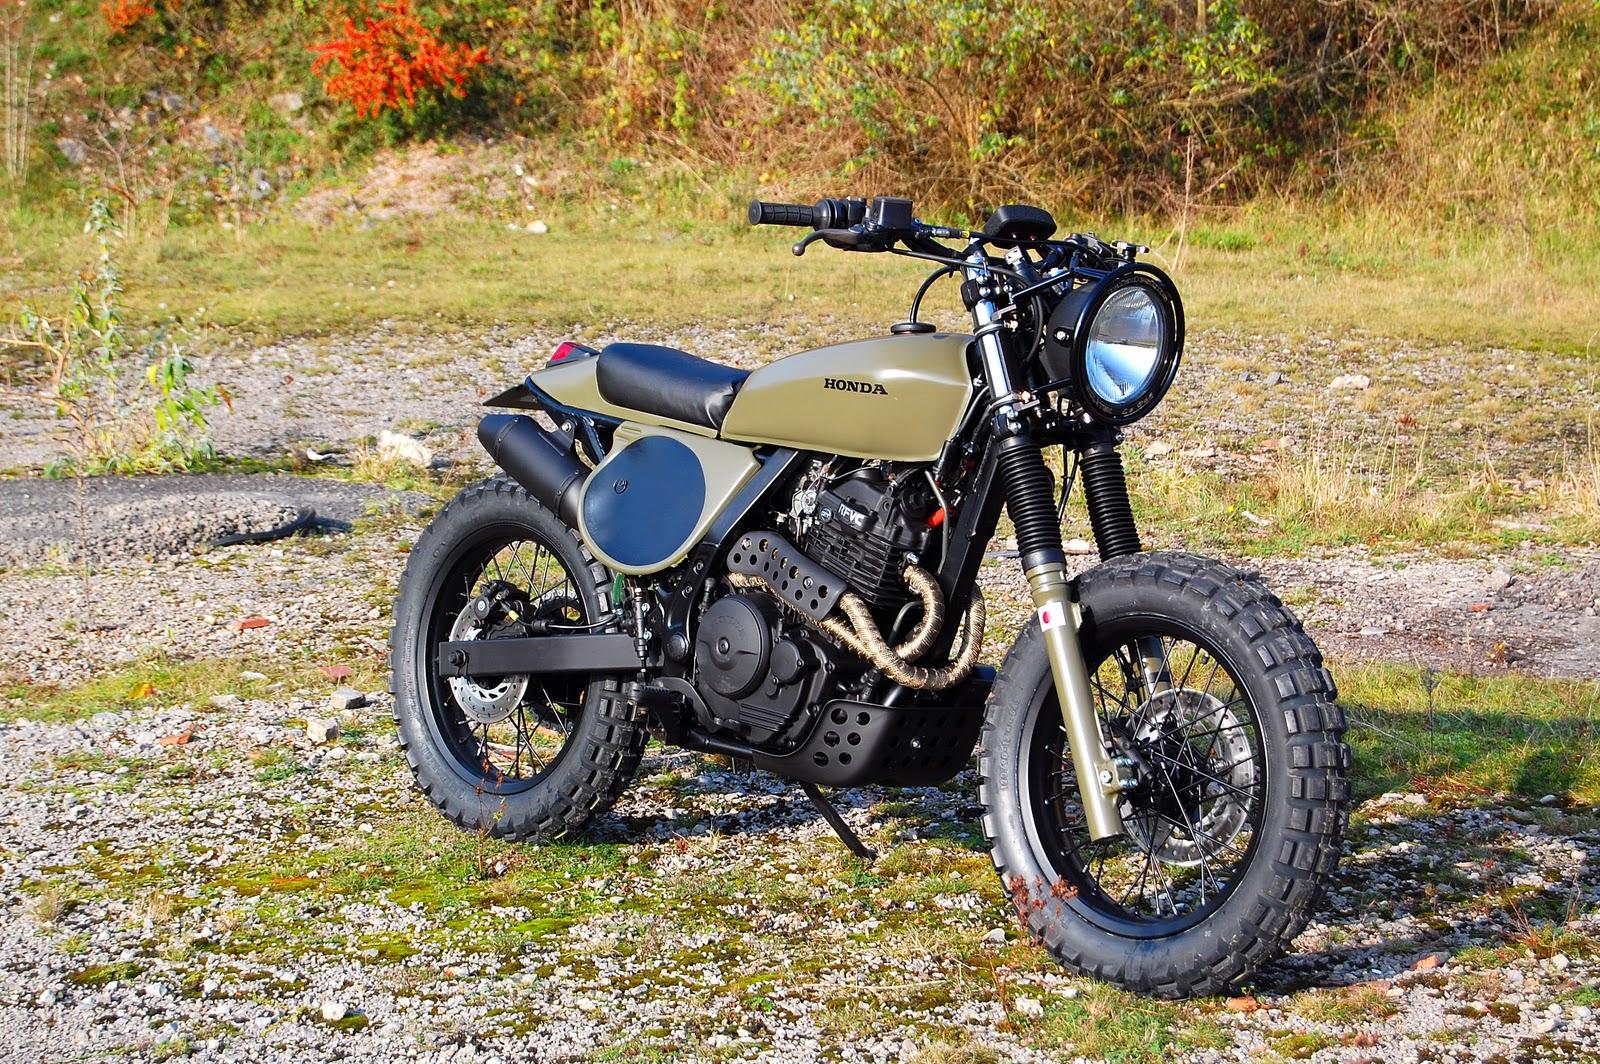 Honda NX Dominator Street Tracker Scrambler Motorcycle